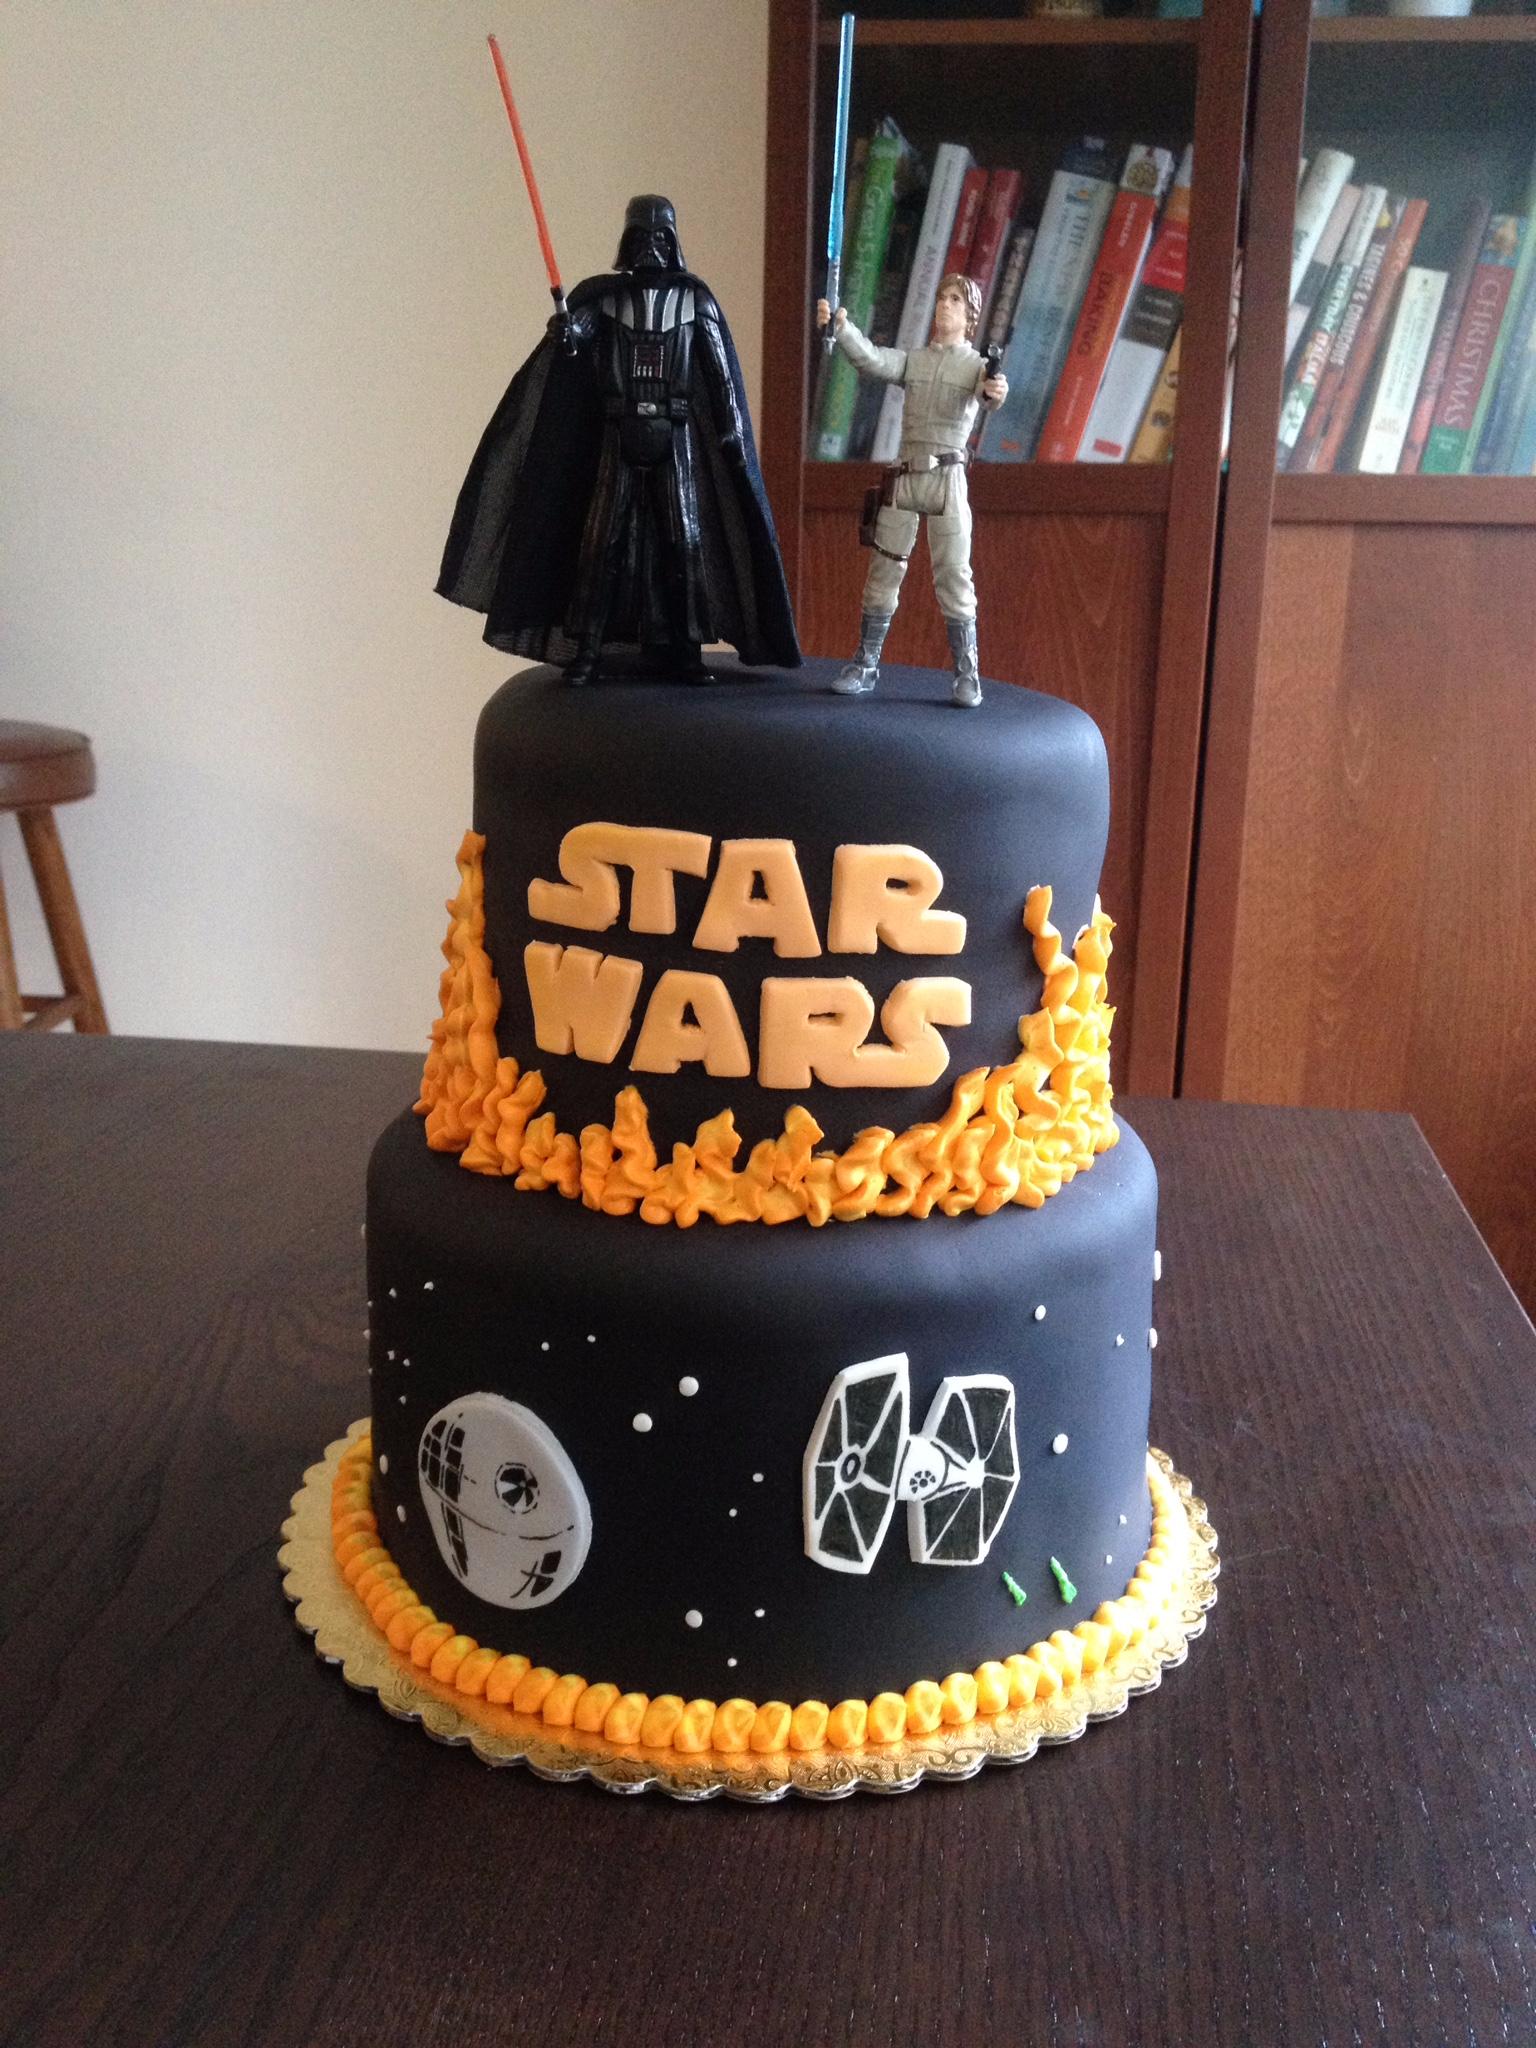 Star Wars Cake Darthvader Lukeskywalker Tiefighter Deathstar